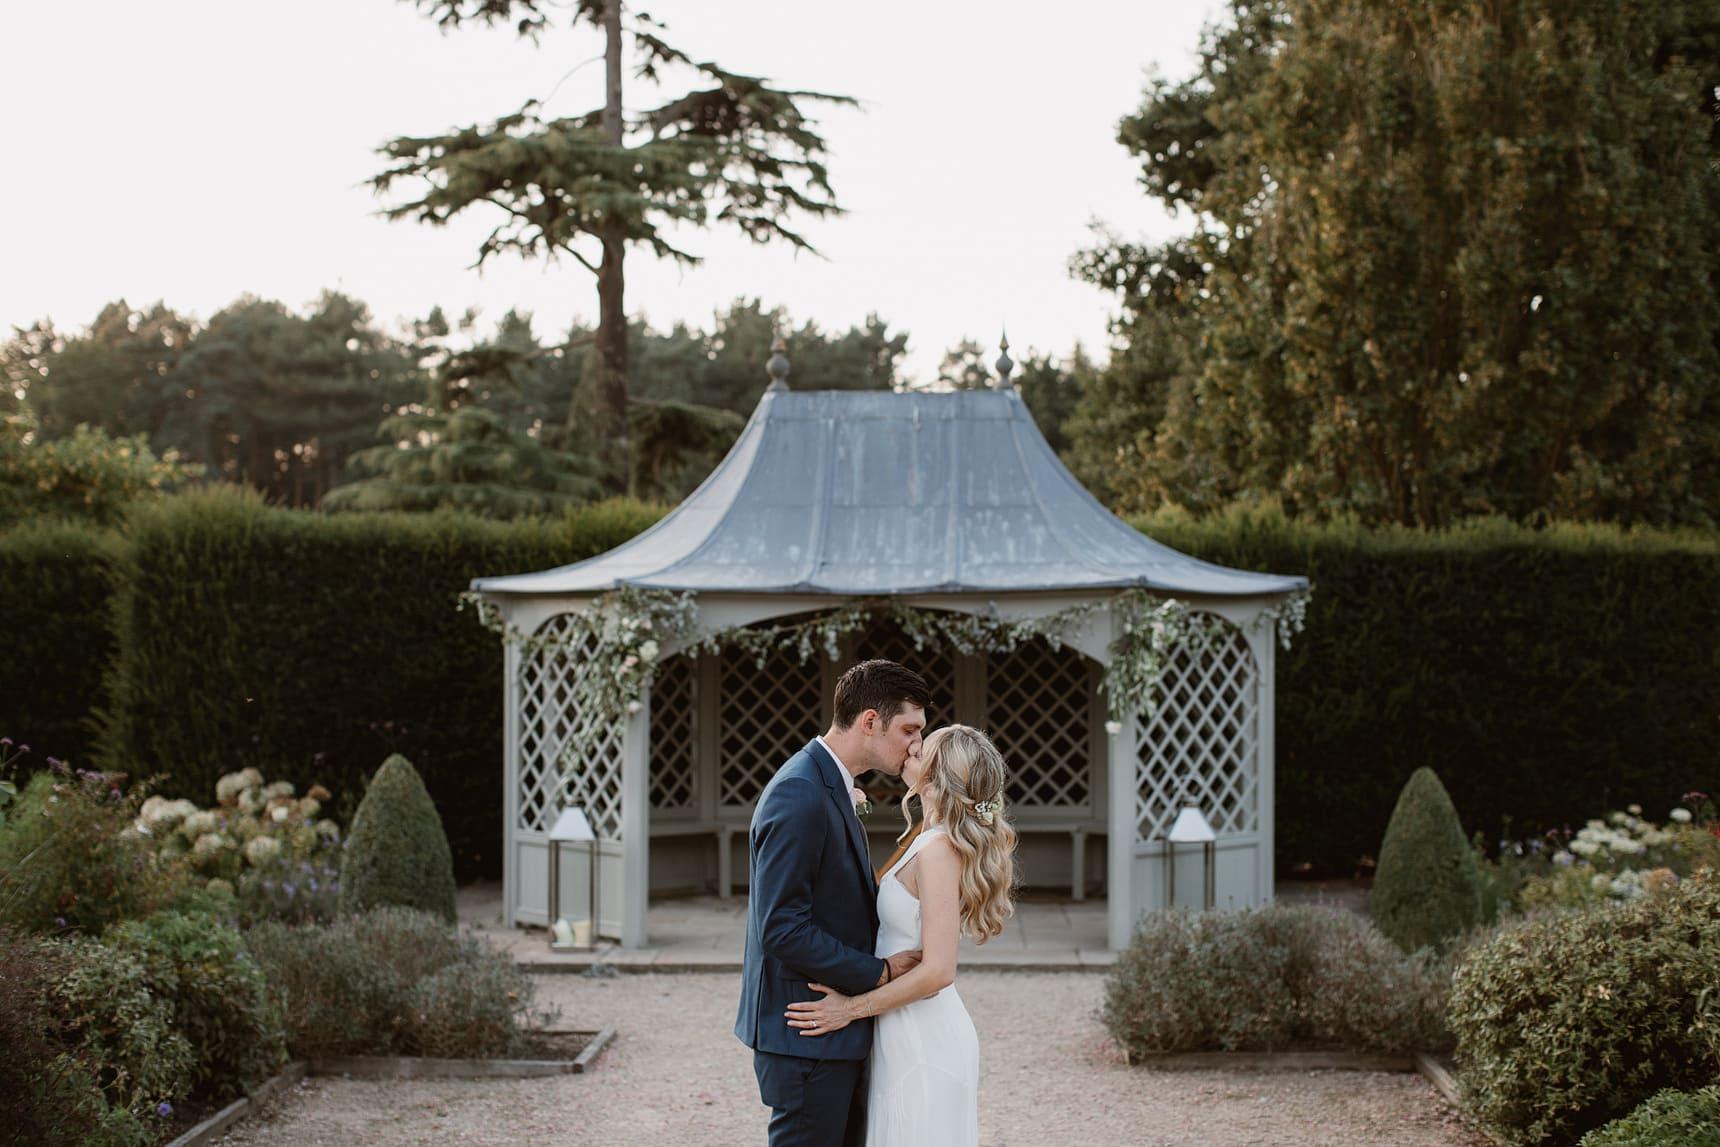 wedding venues essex large gardens